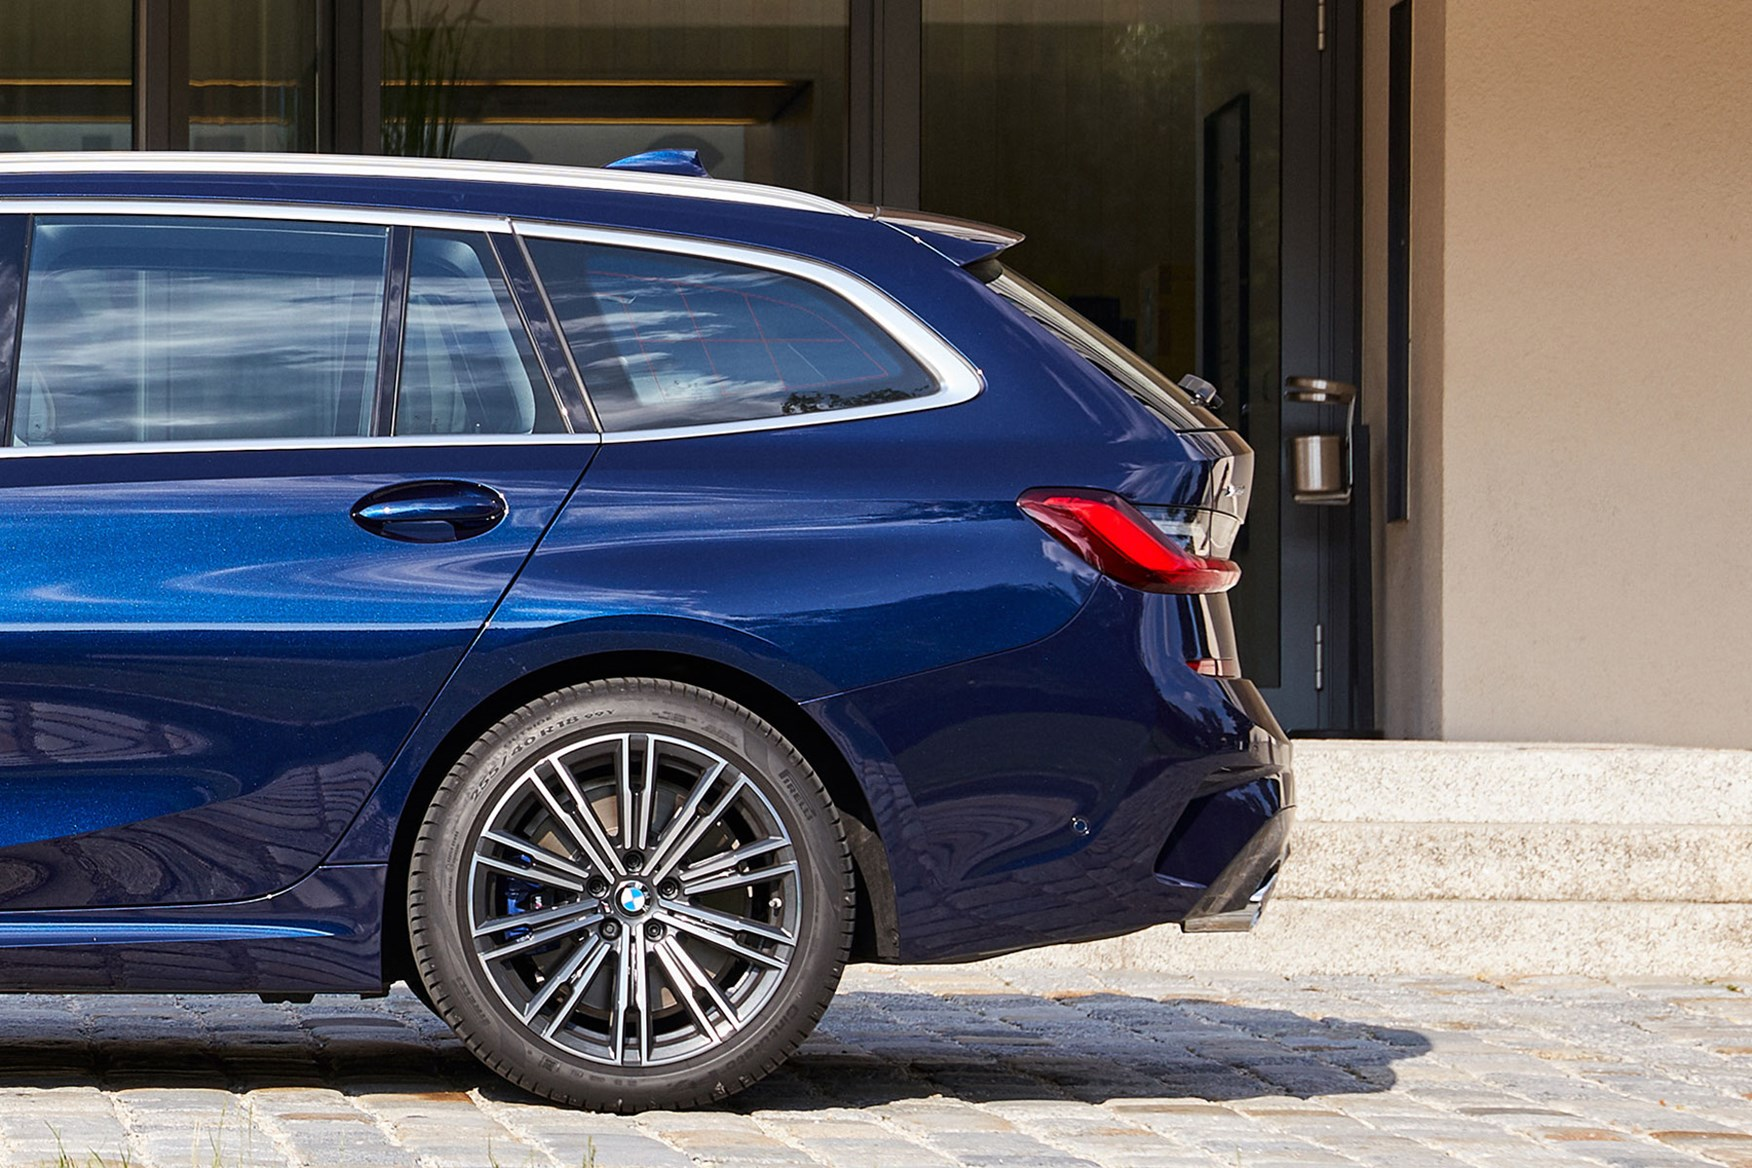 BMW 3-Series Touring (2019) Interior, Dashboard